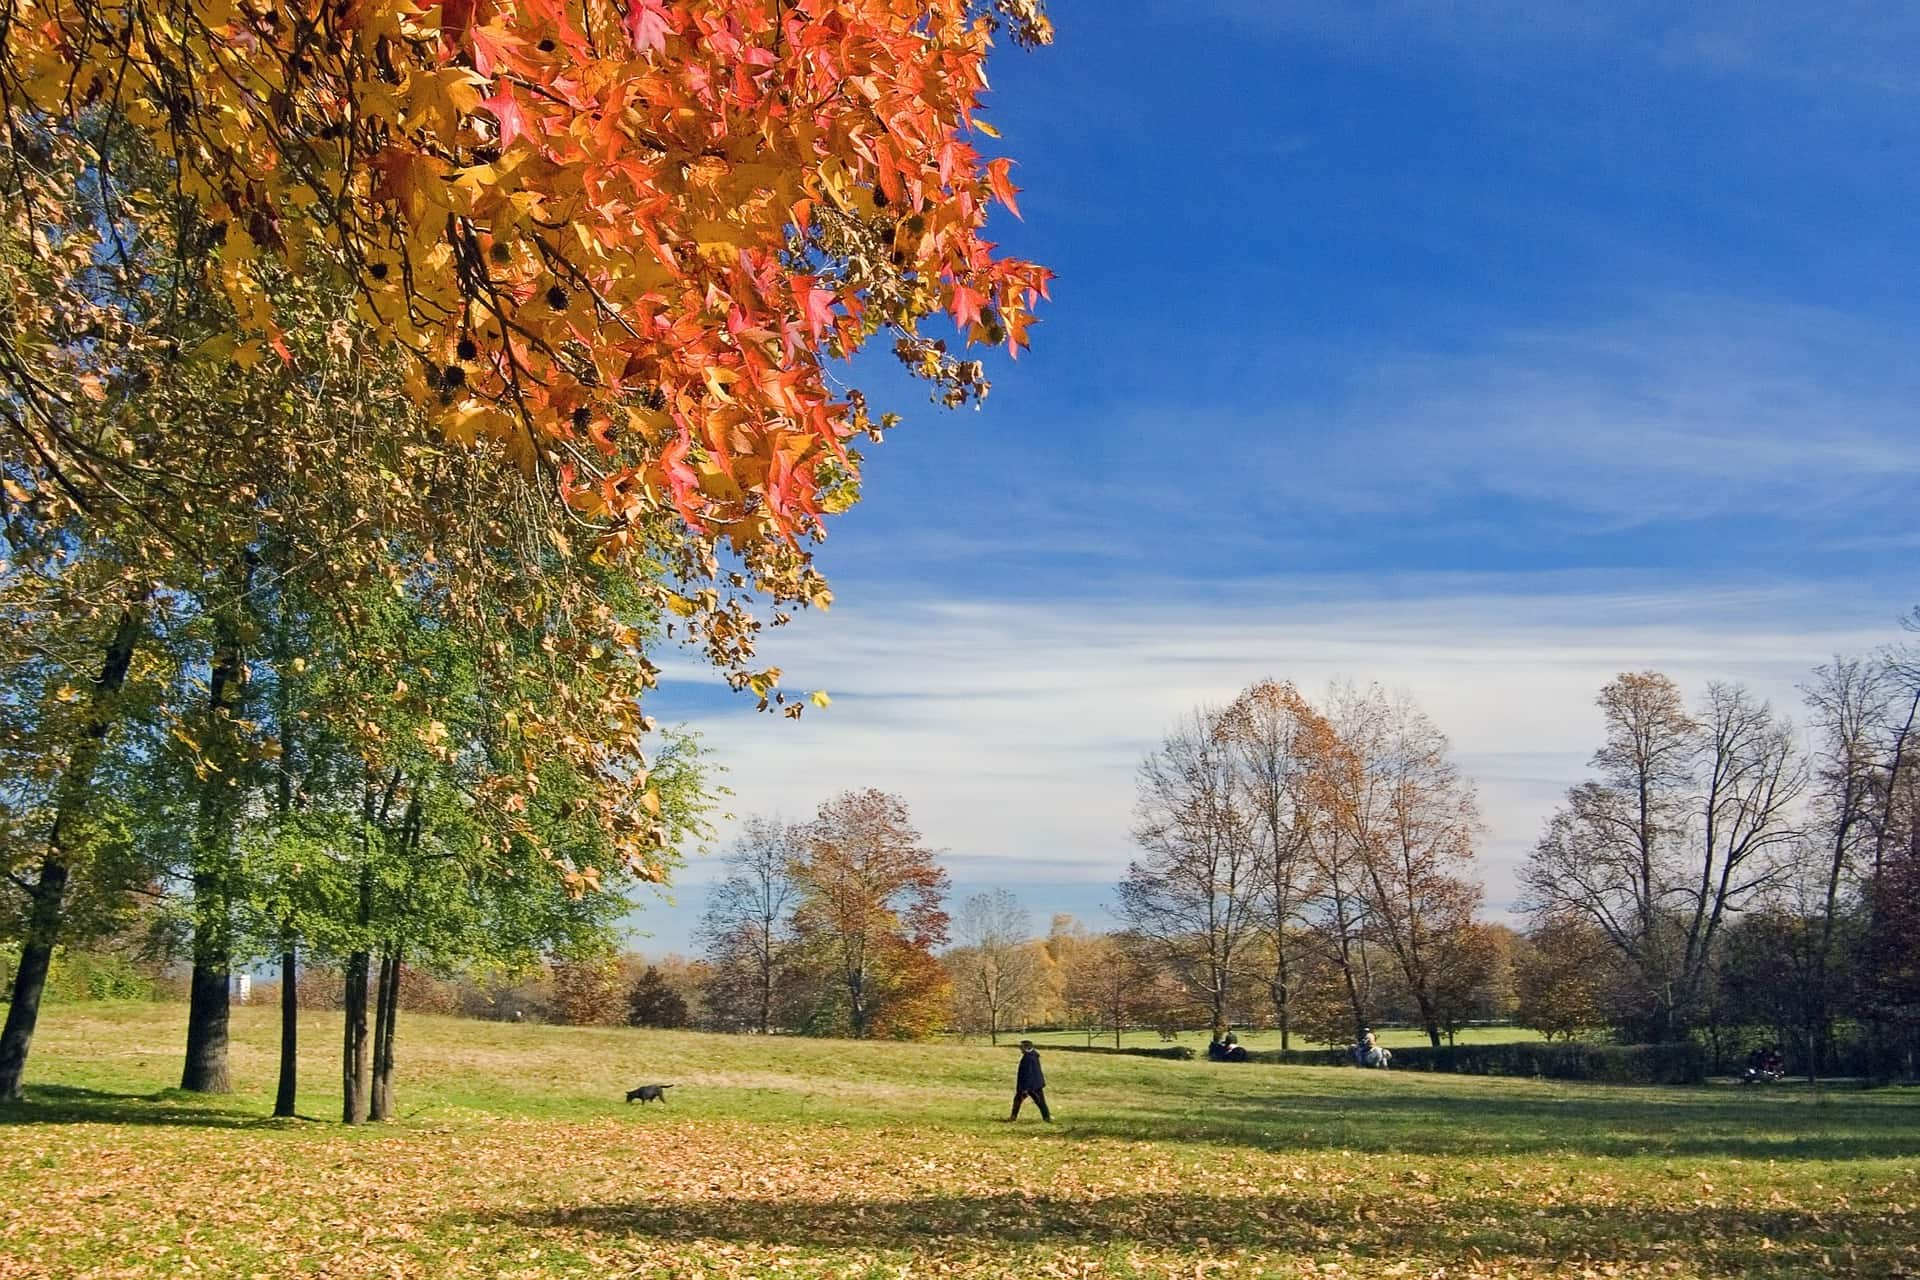 autunno soft